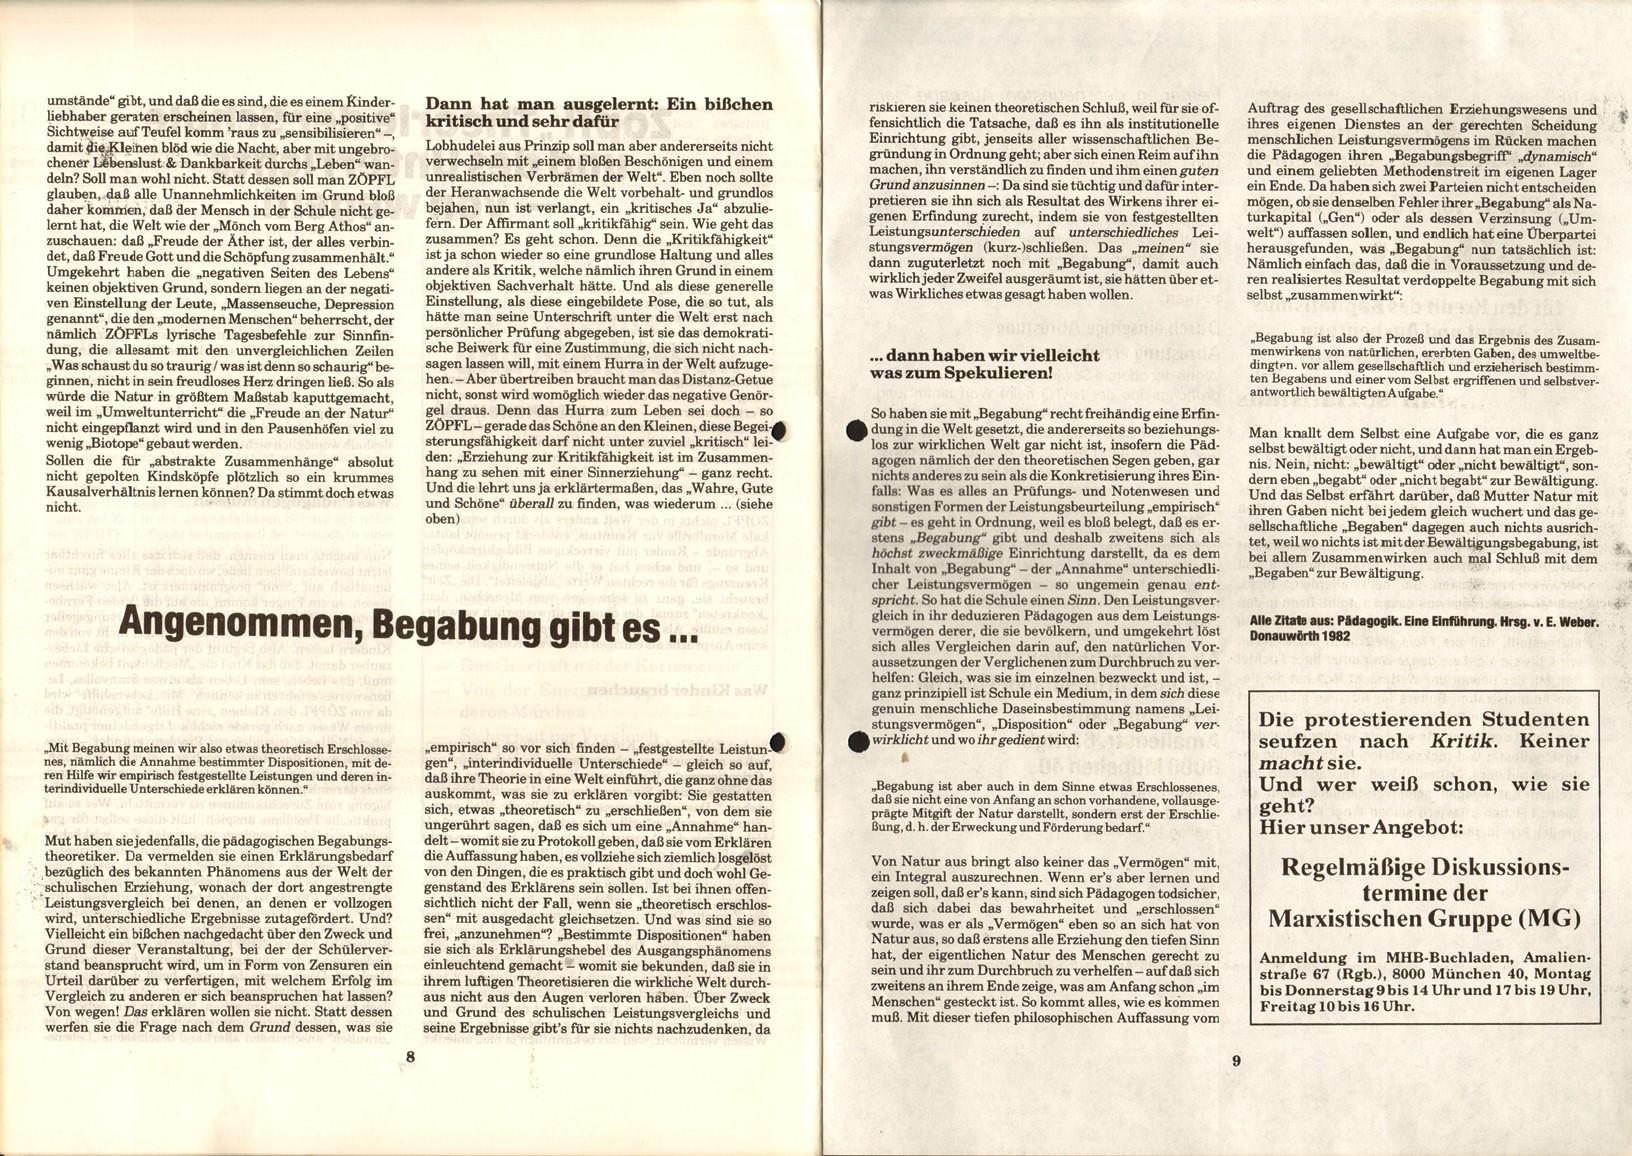 Muenchen_MG_FB_Paedagogik_19881001_05